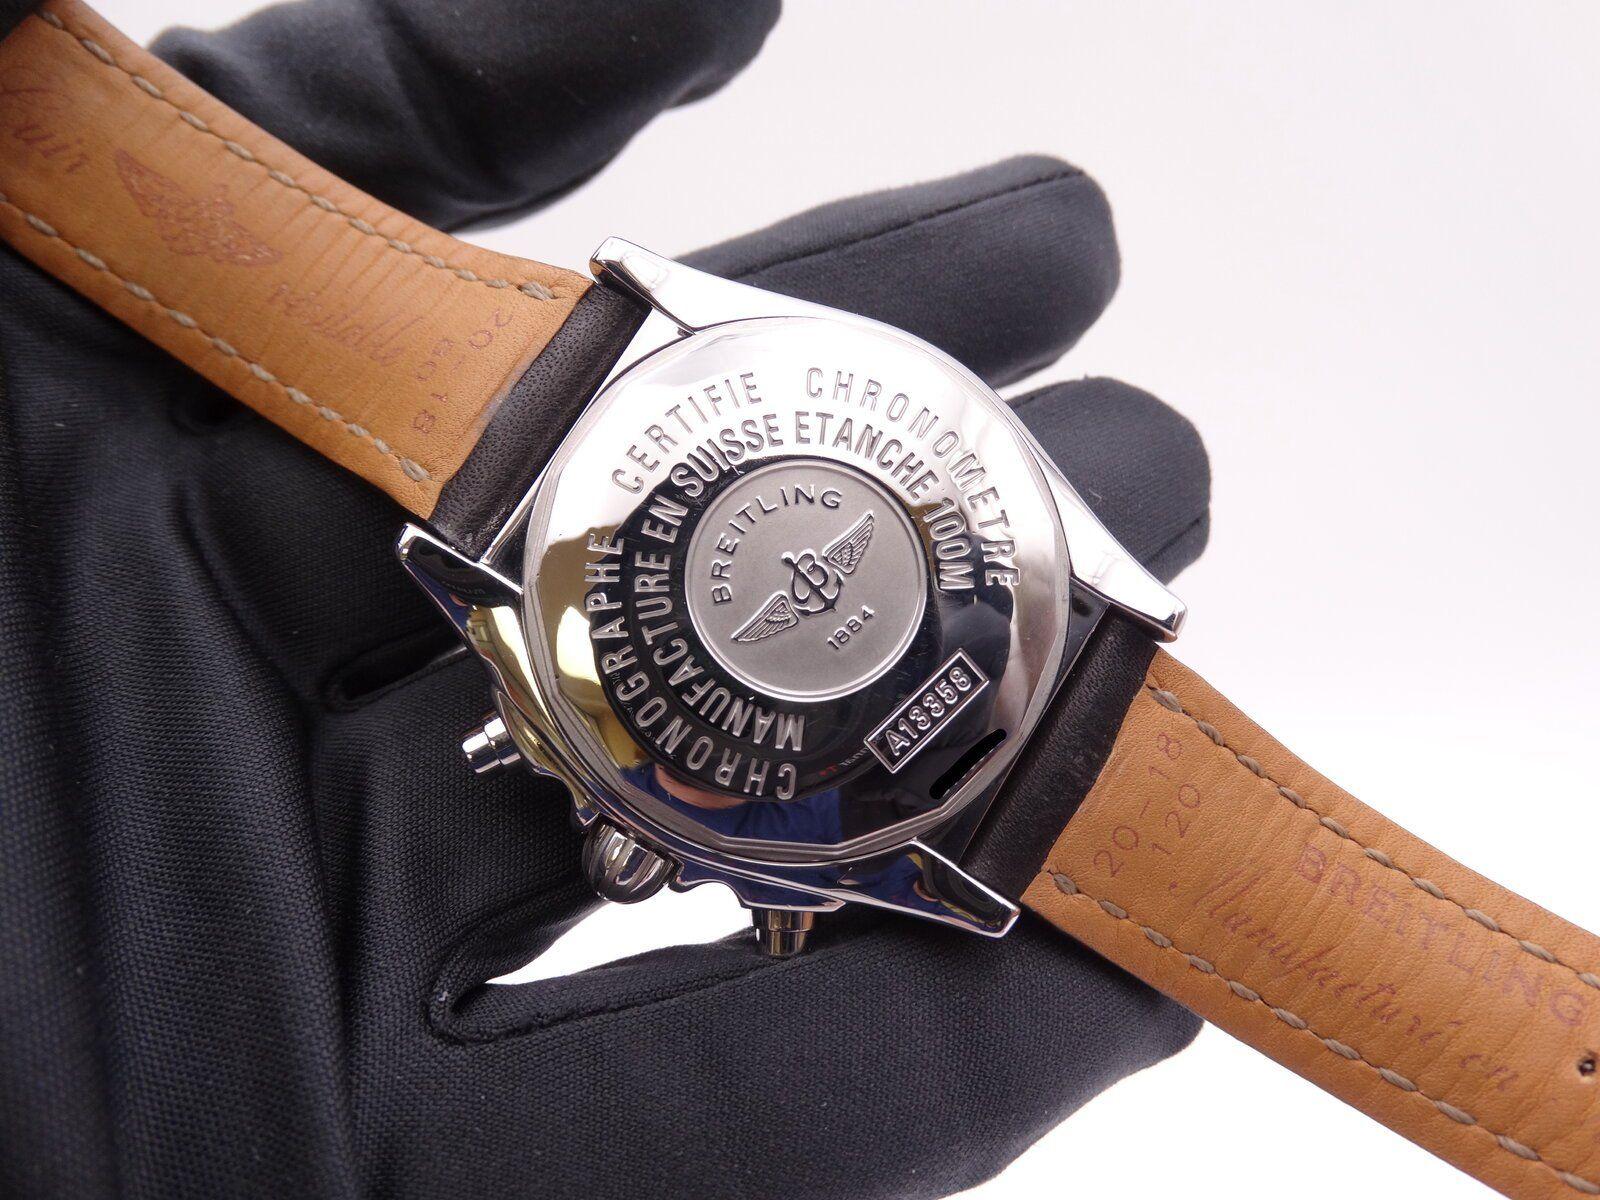 Breitling A13358 Cockpit Chronograph Automatic 01087 copia.JPG